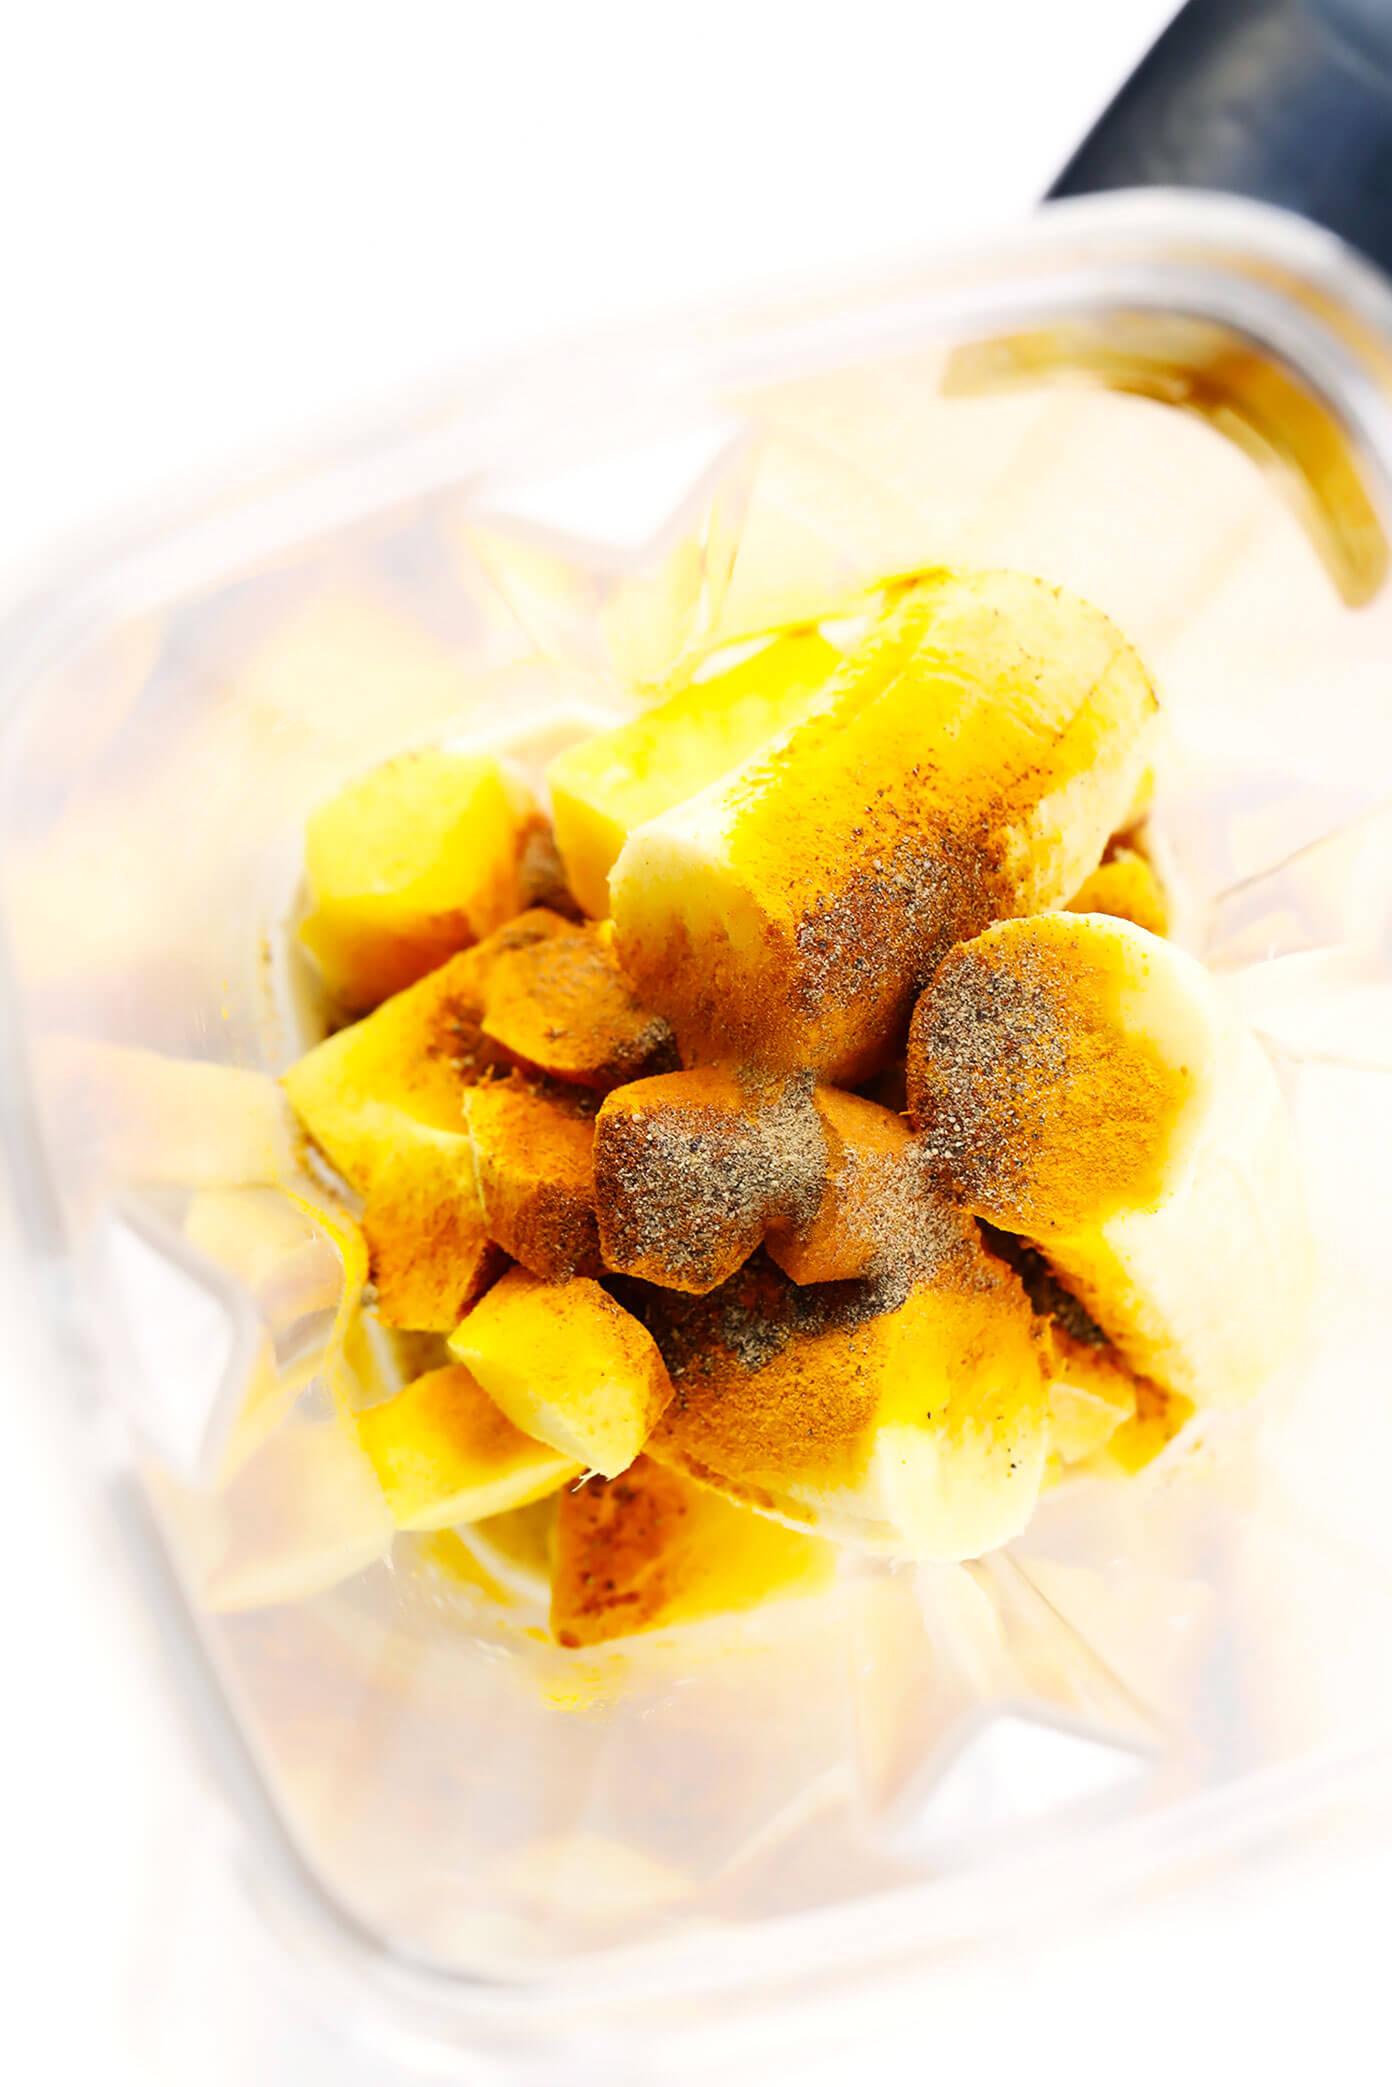 Golden Milk Smoothie Ingredients | Mango (or Pineapple), Banana, Ginger, Milk, Turmeric, Black Pepper and Cinnamon